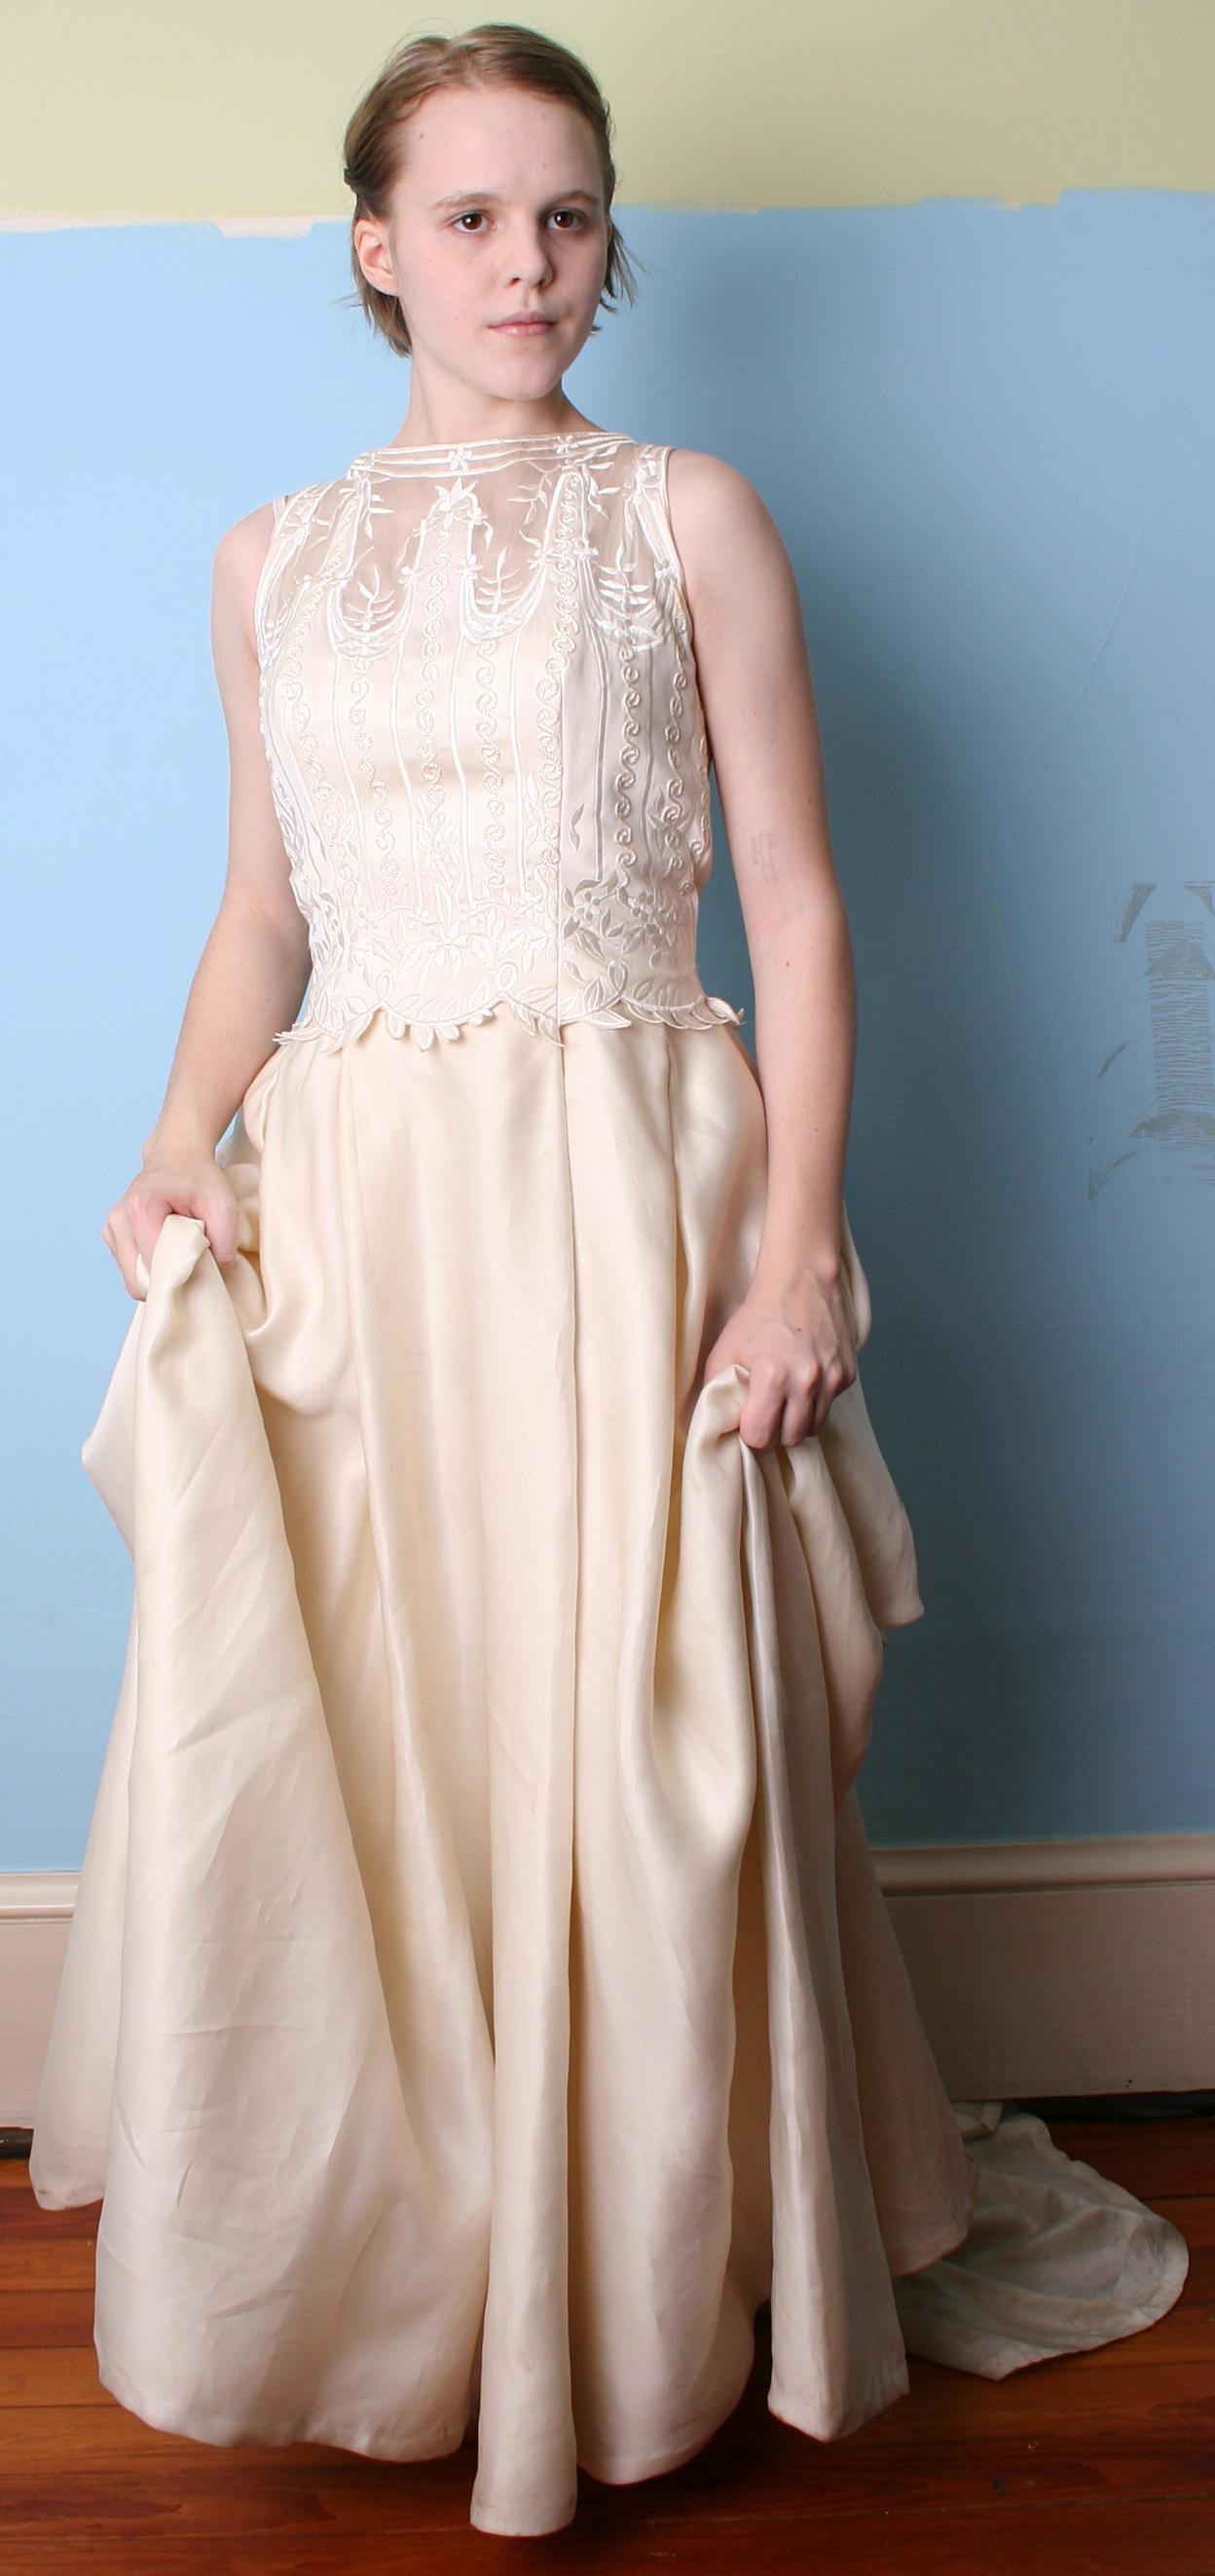 Wedding Dress 3 by AttempteStock